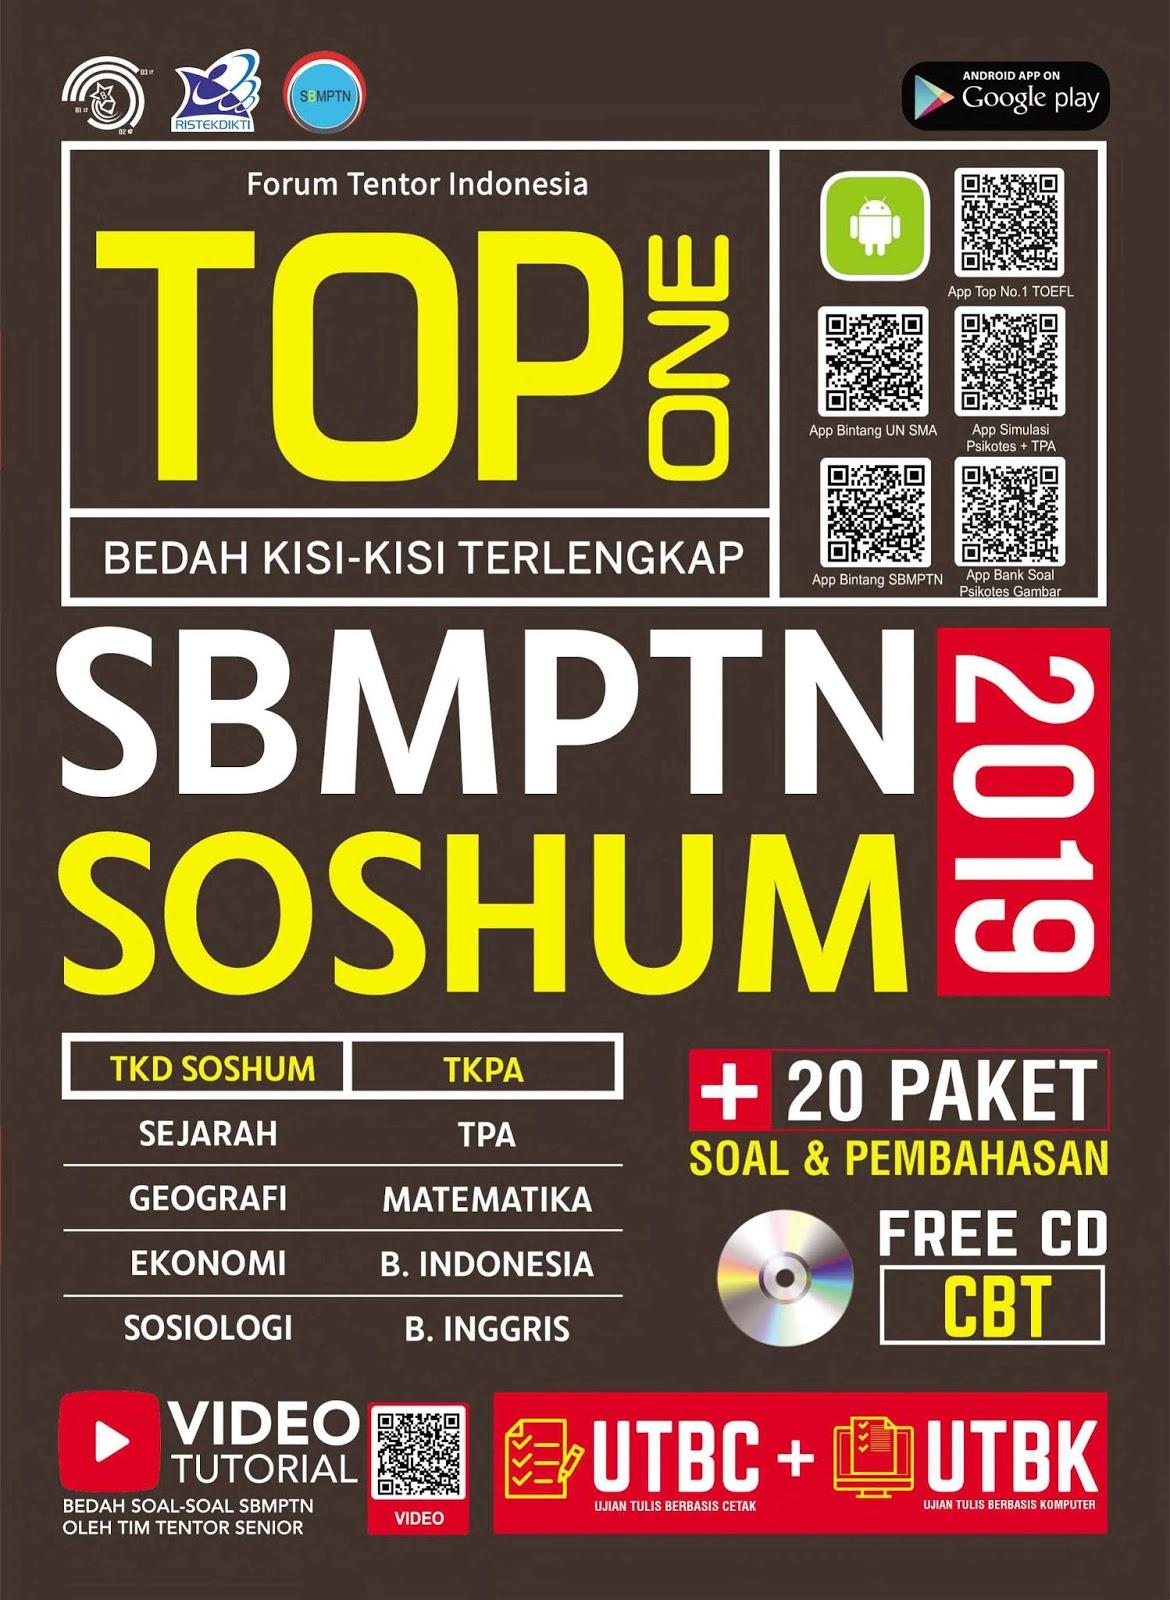 TOP One Bedah Kisi-kisi Terlengkap SBMPTN SOSHUM